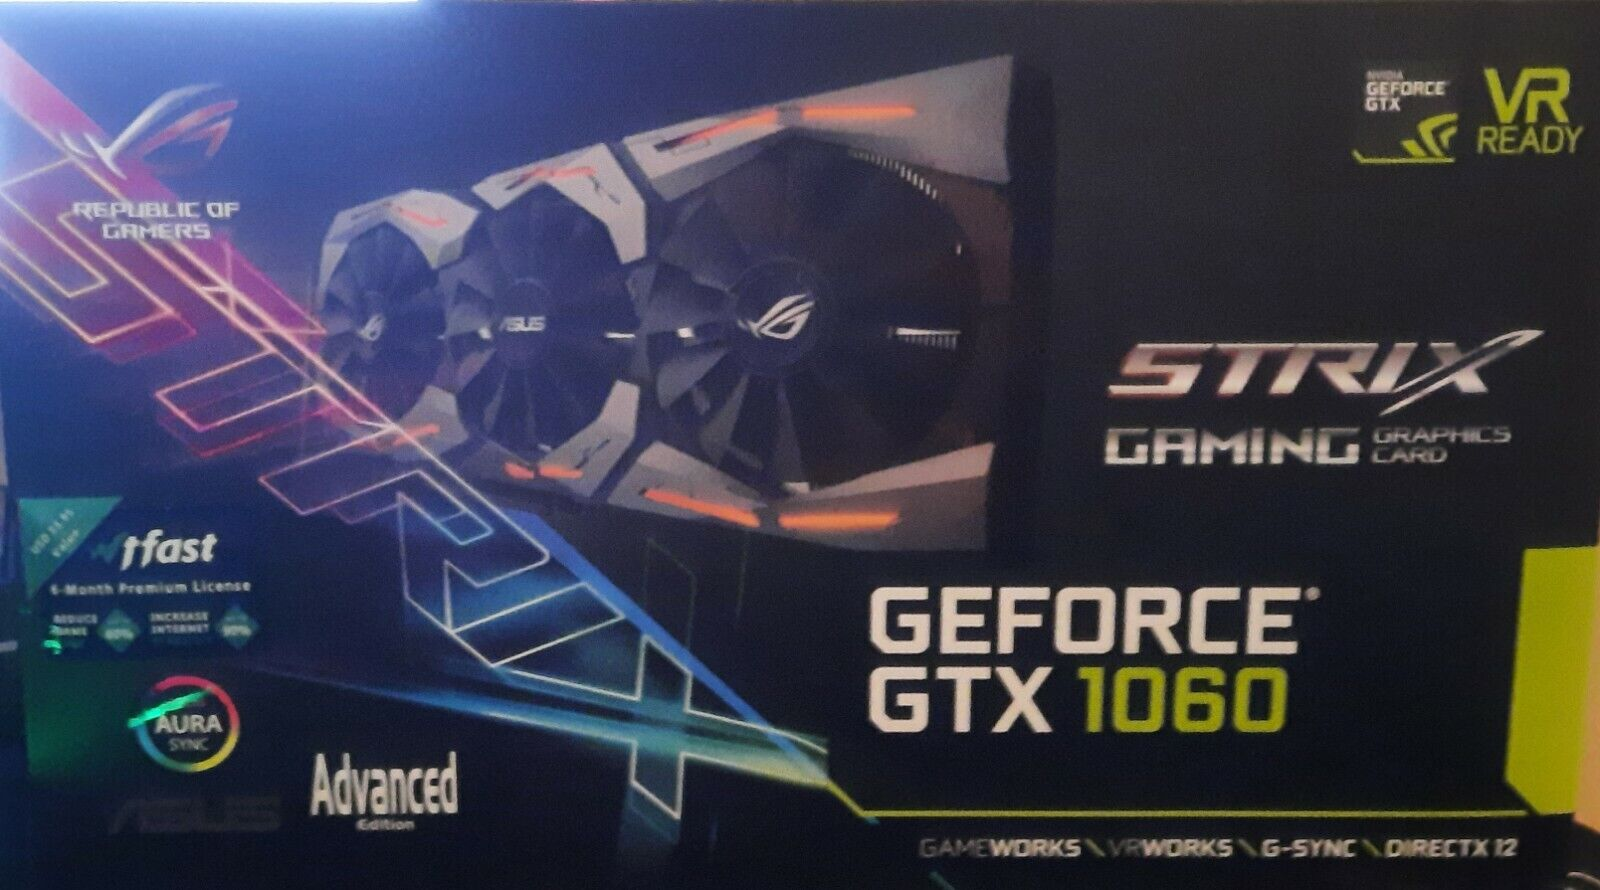 ASUS Rog STRIX GeForce GTX 1060 OC 6GB GDDR5 Grafikkarte